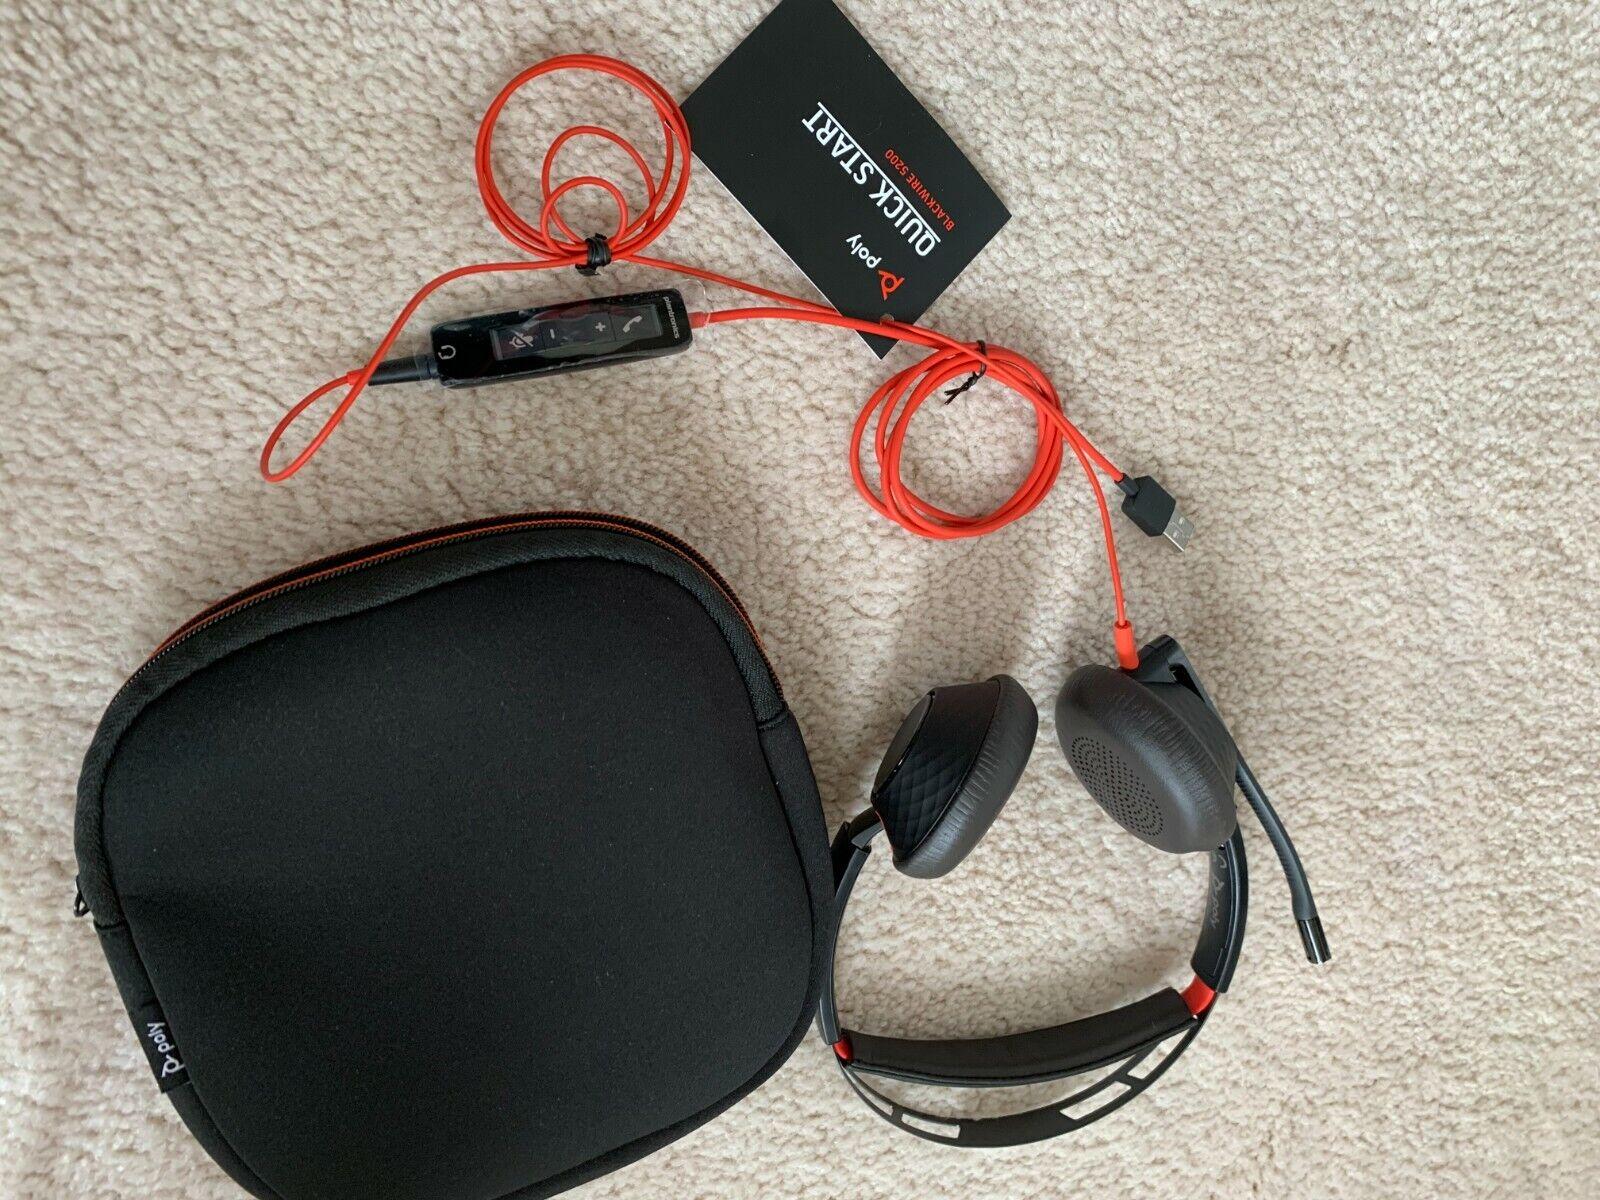 Poly Blackwire 5200 Series C5220t USB Headset - Black - $54.99